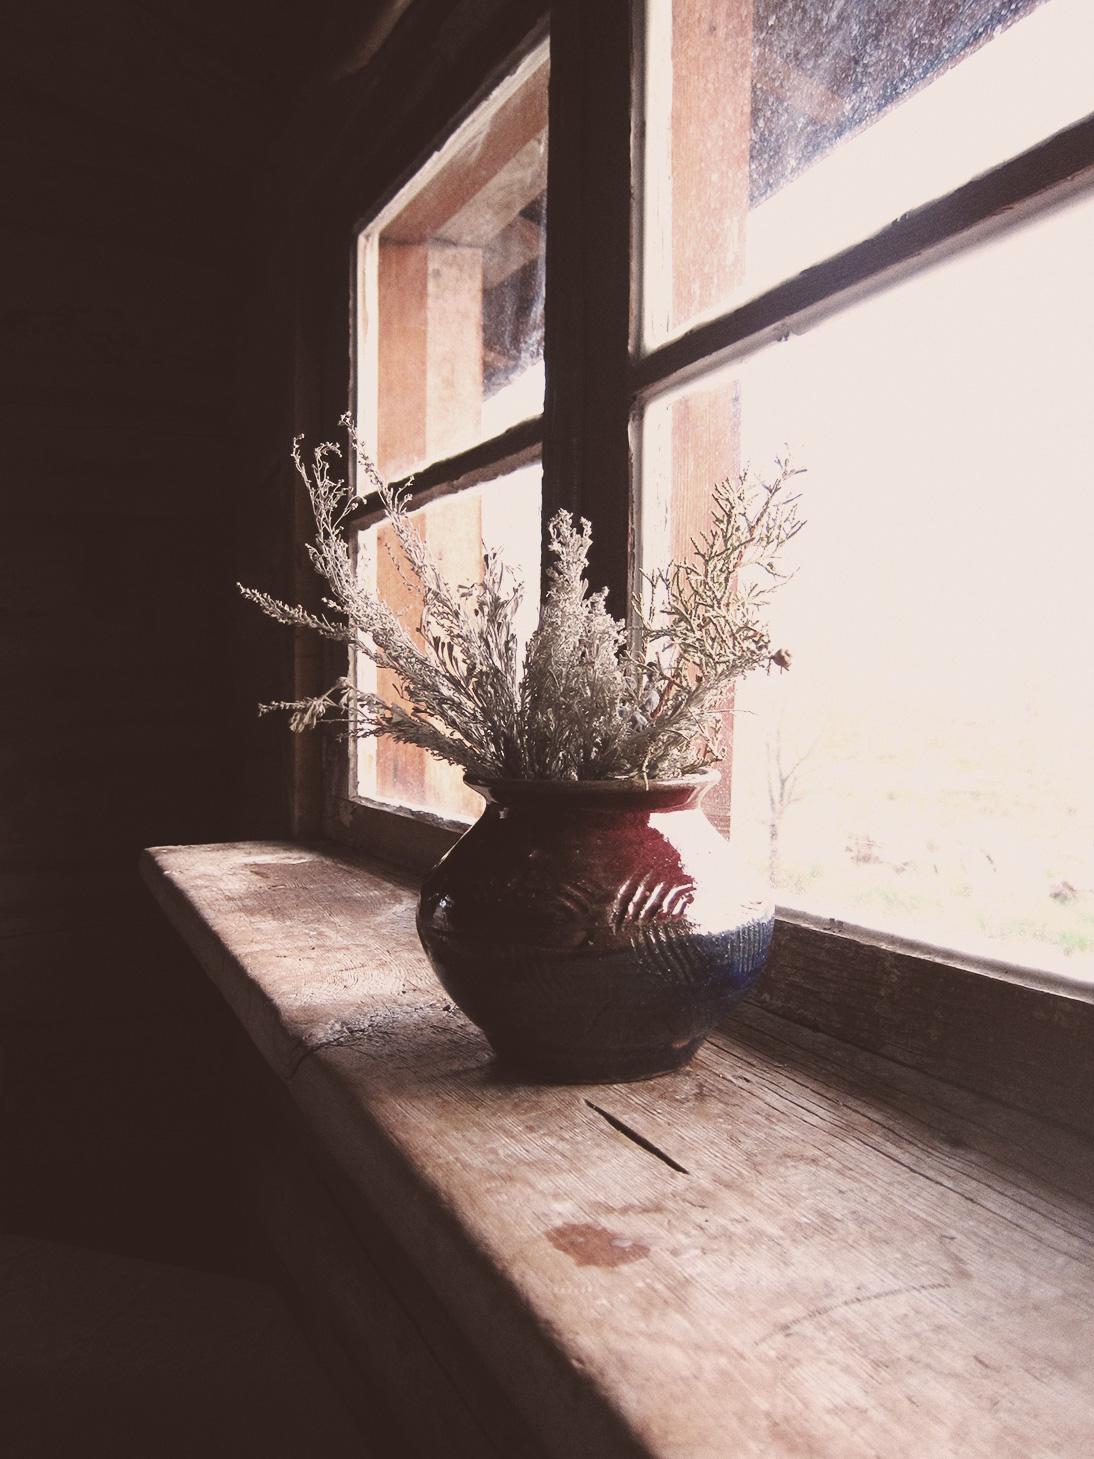 log-cabin-window